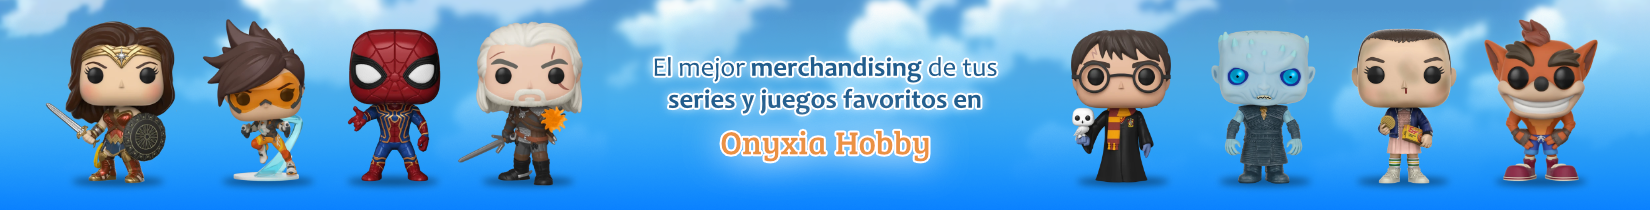 Onyxia Hobby